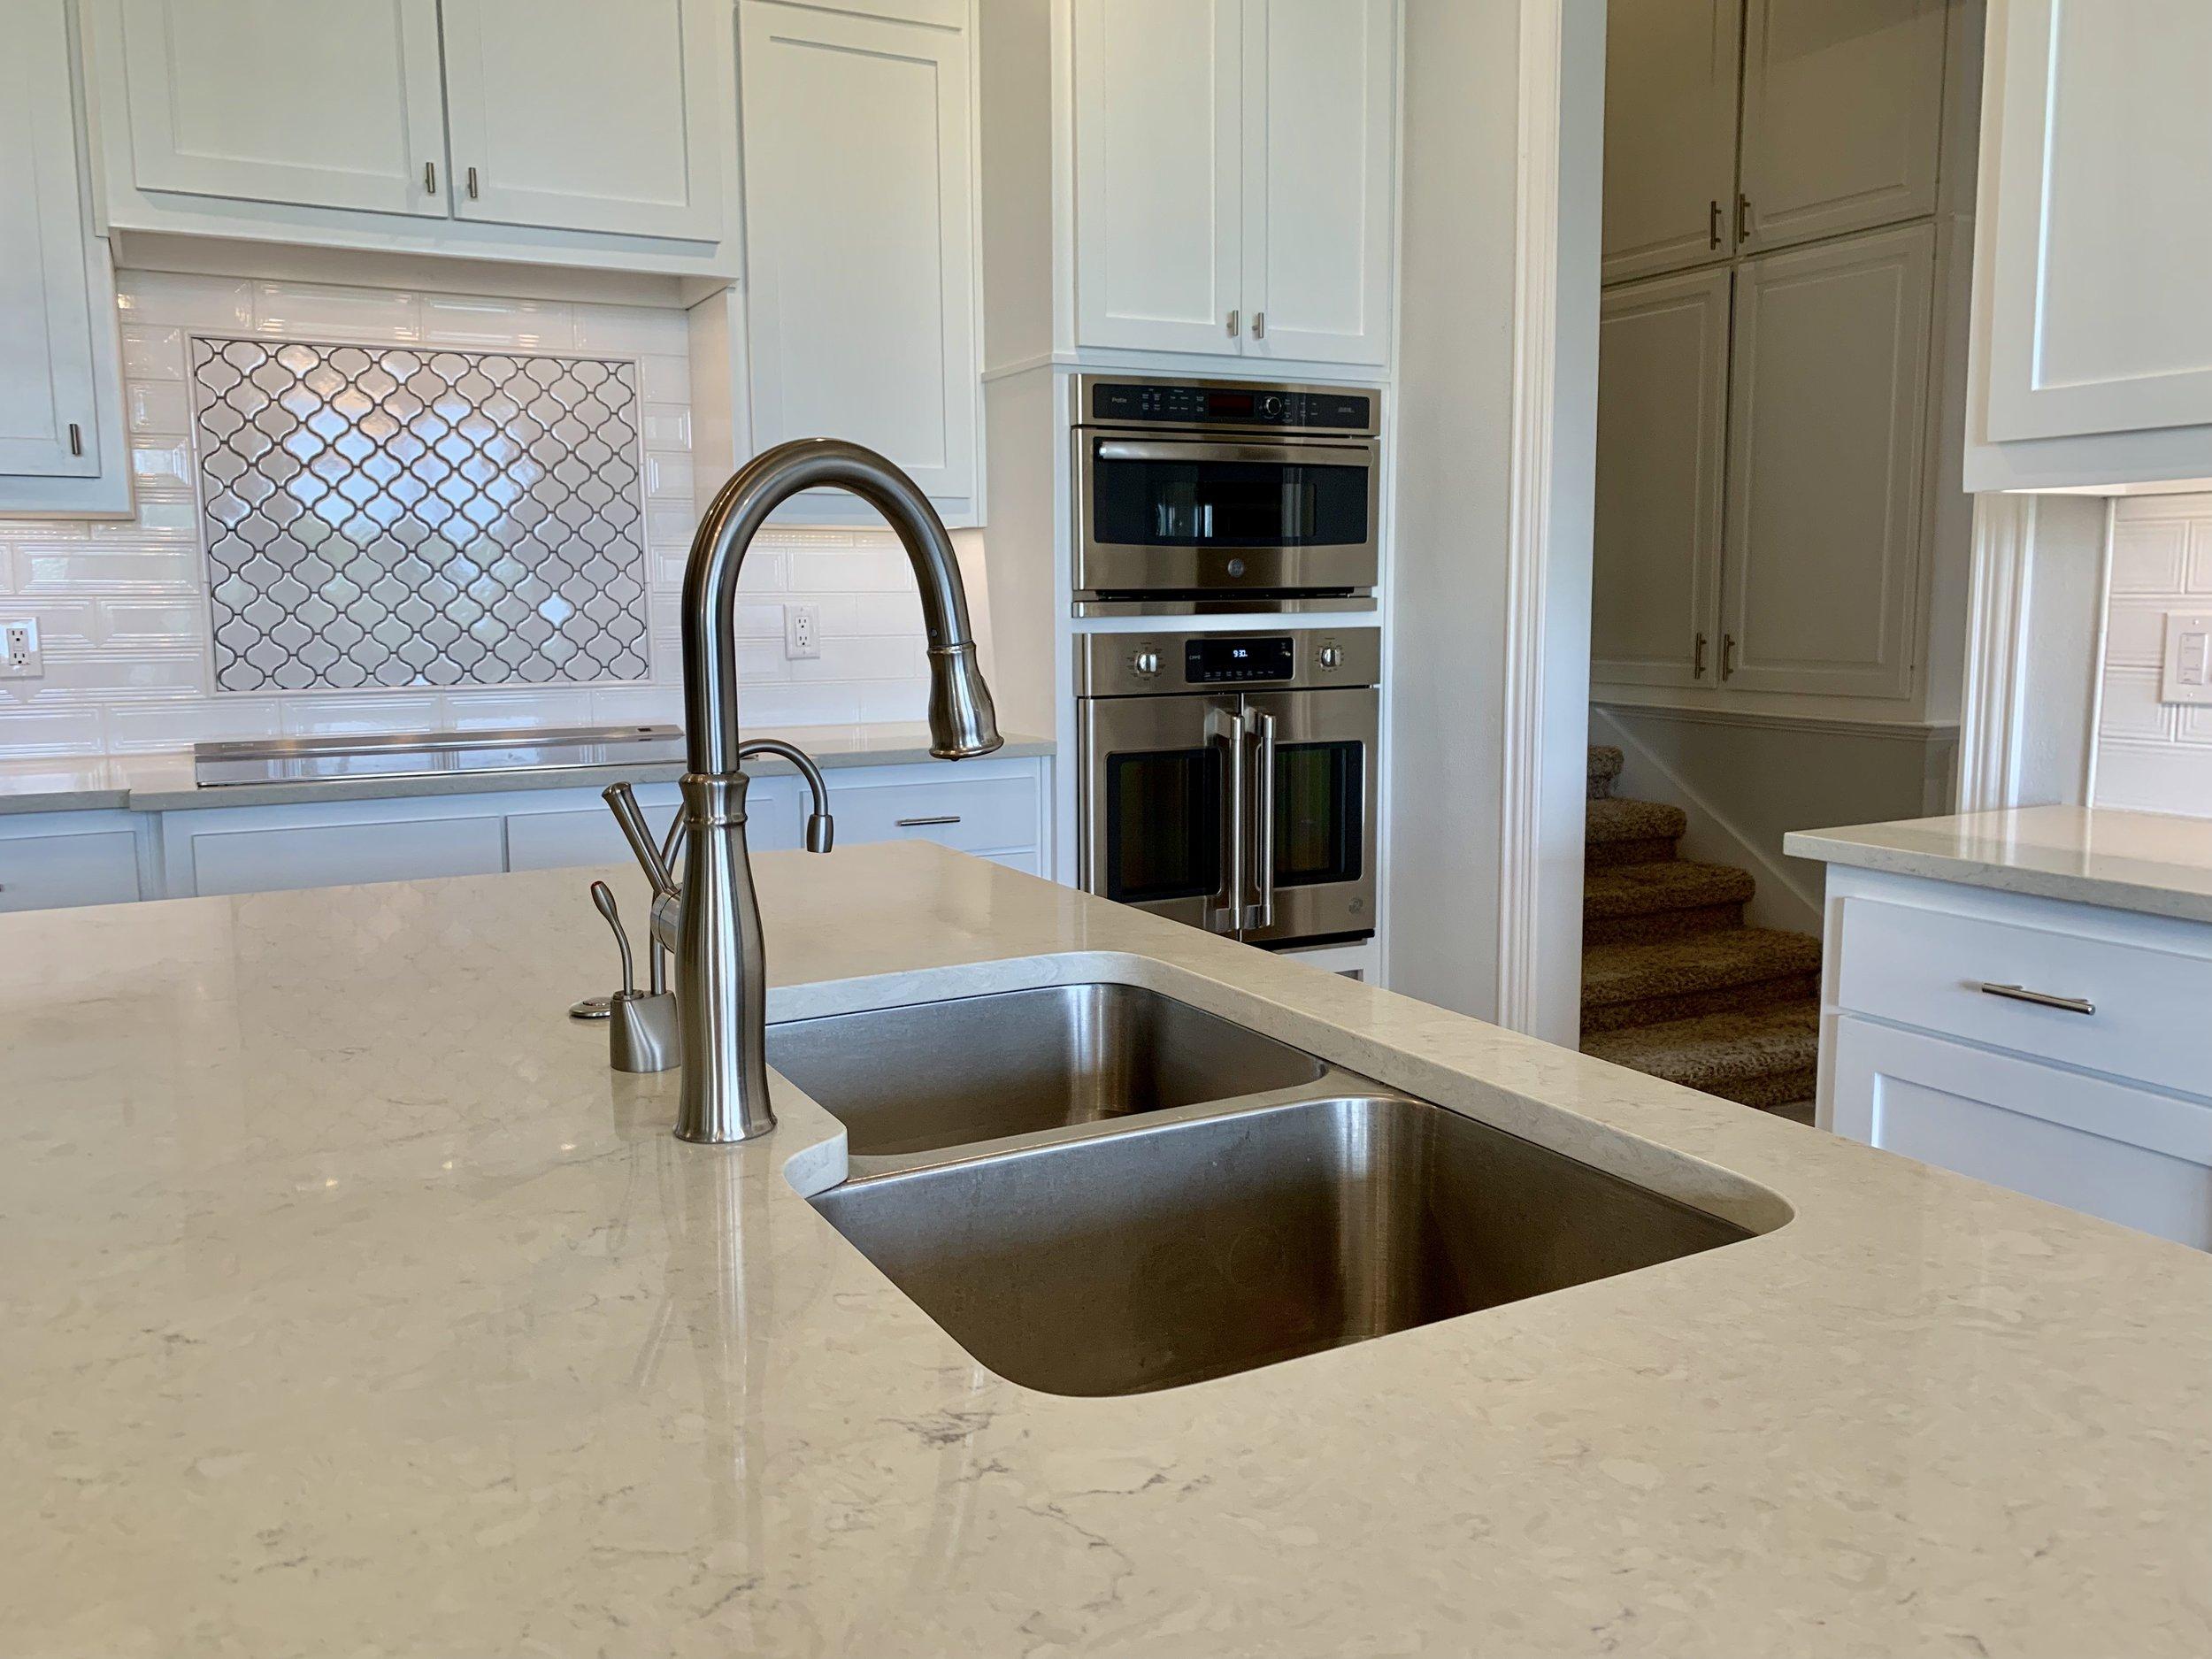 Sink & Backsplash